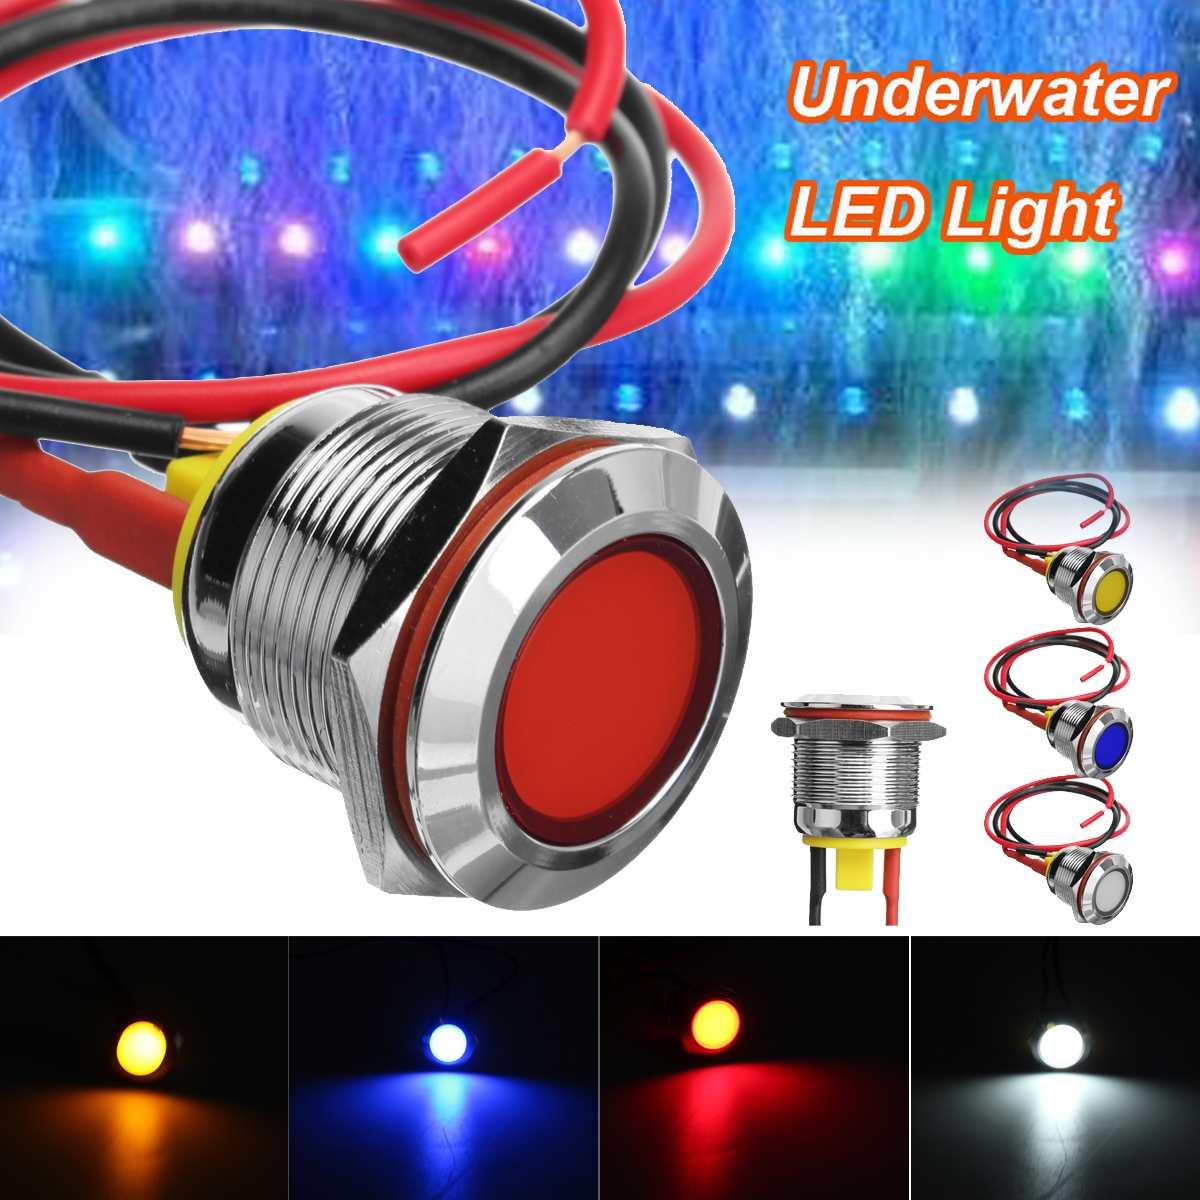 Lights & Lighting 1pc Dc 6v 19mm Ip67 Boat Light Waterproof Underwater Led Light Yellow/red/blue/white Swimming Pool Pond Led Underwater Lights